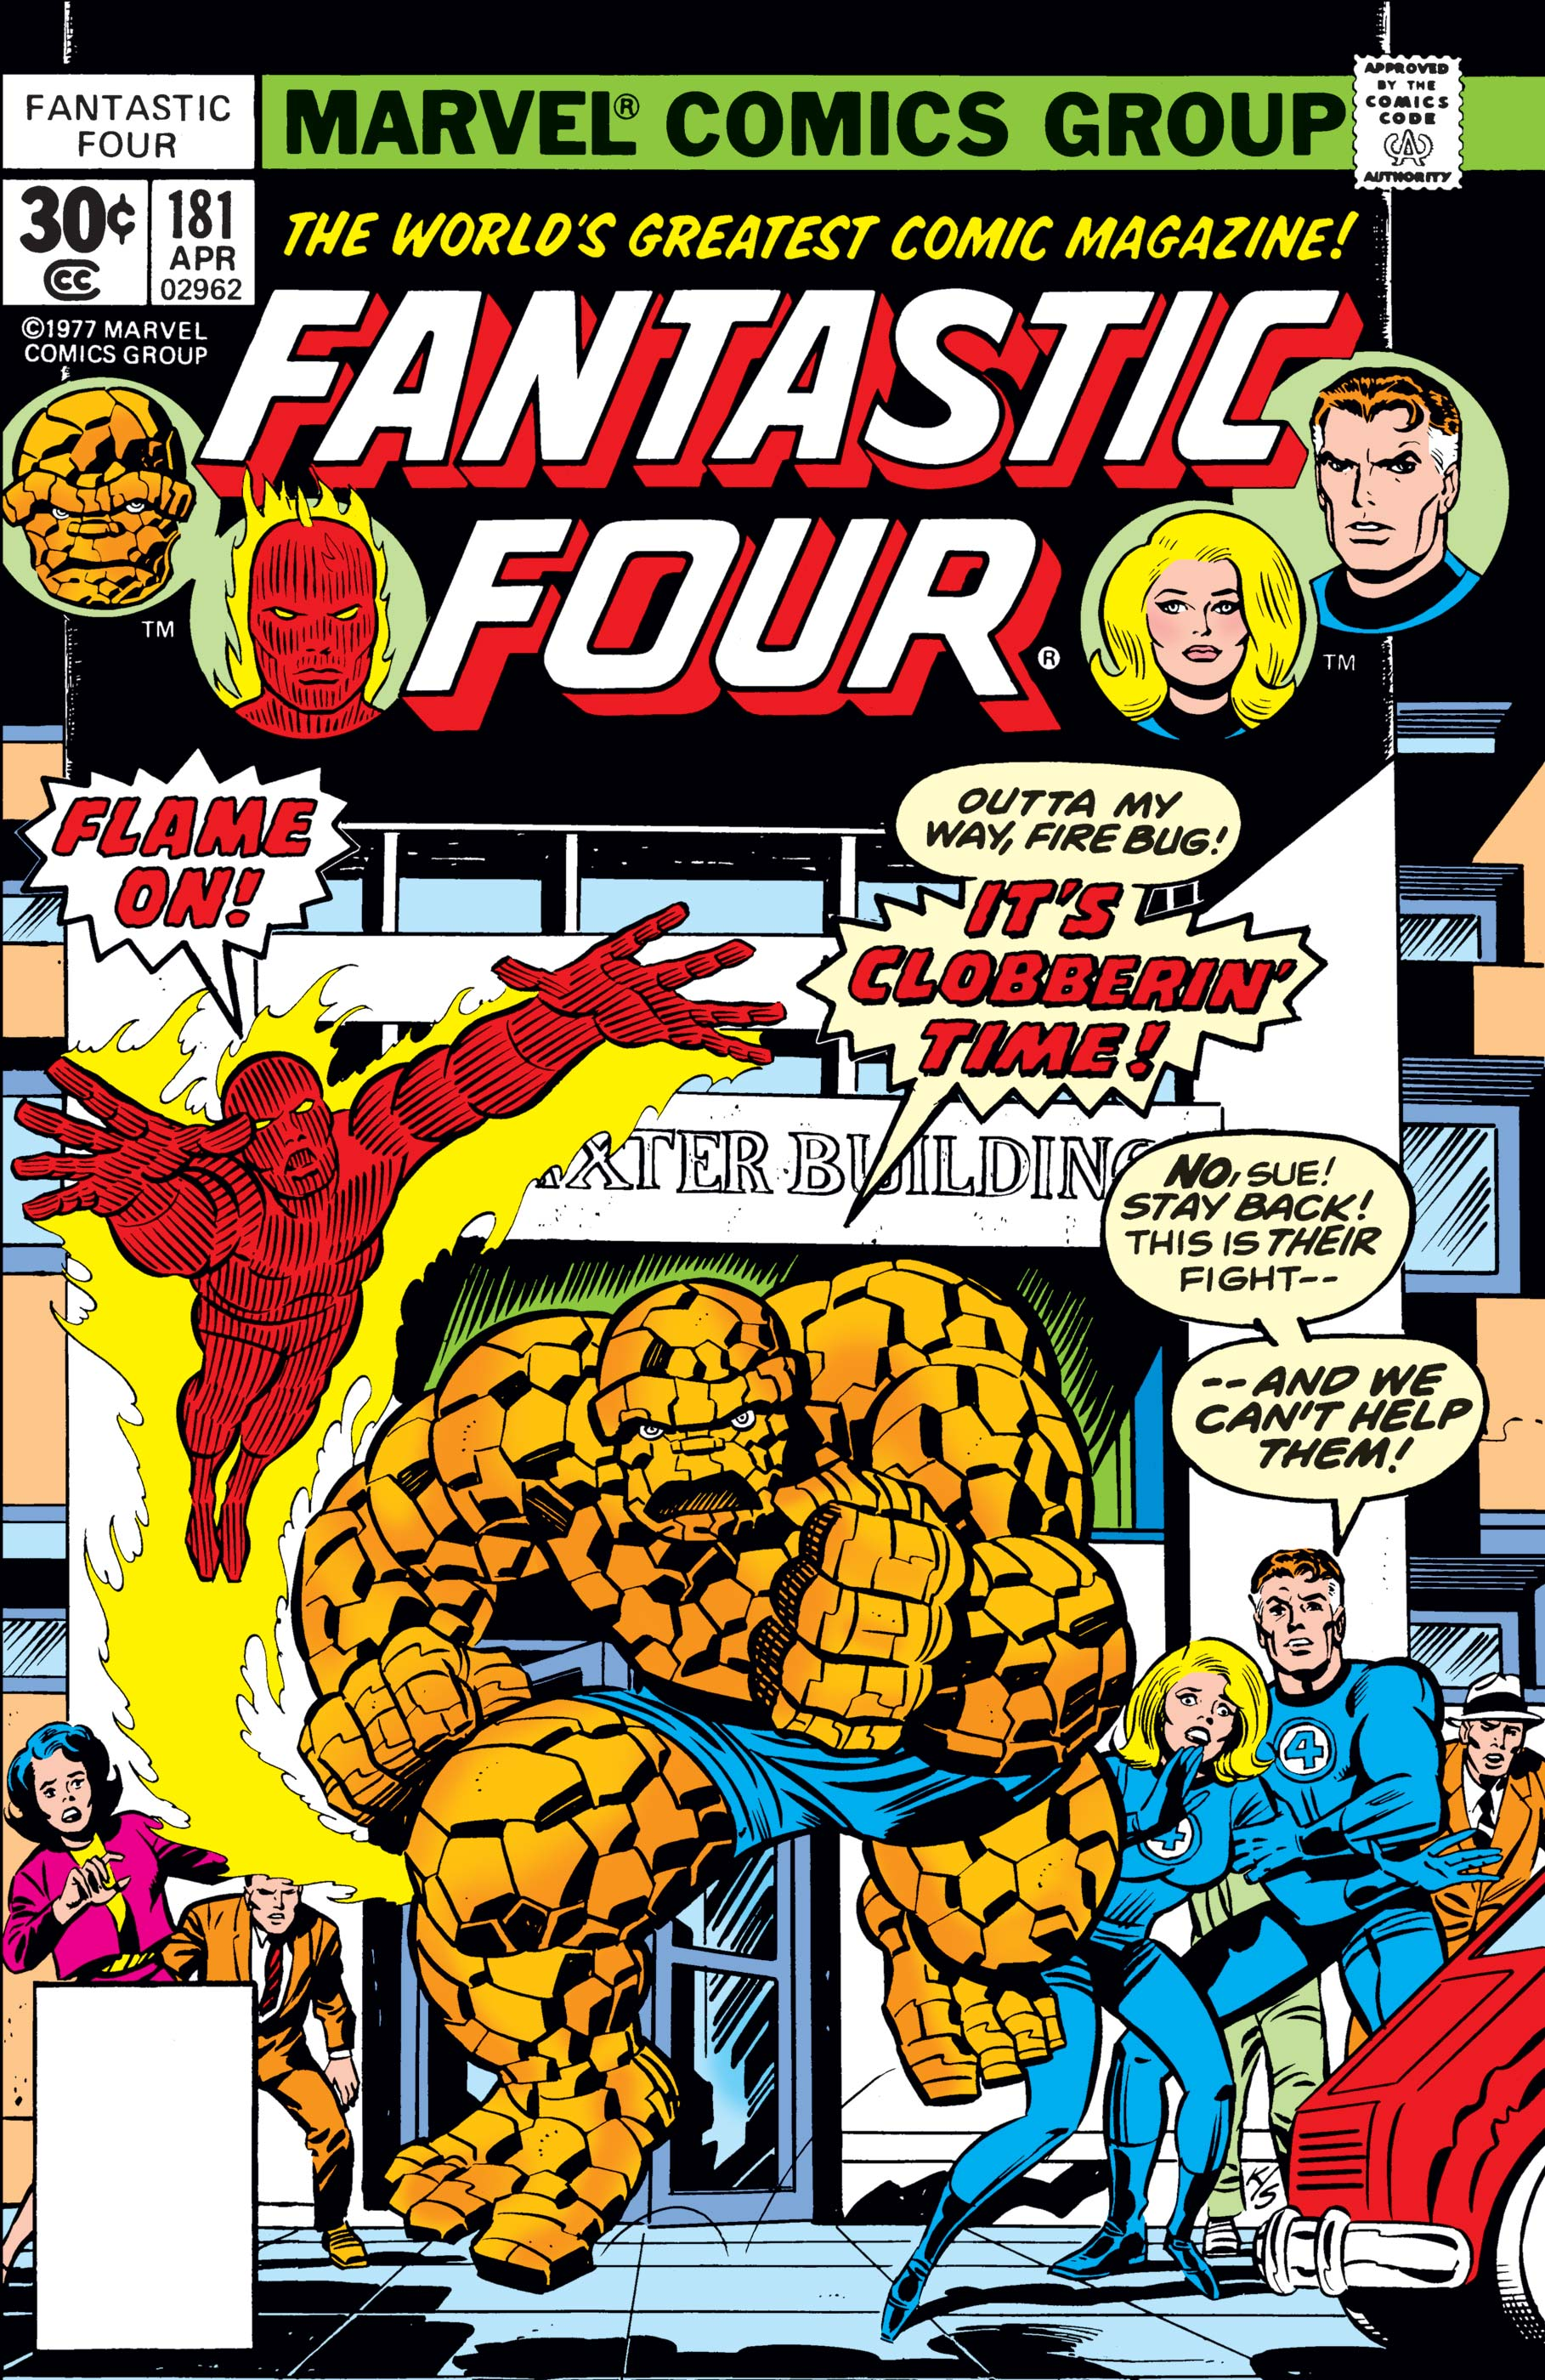 Fantastic Four (1961) #181